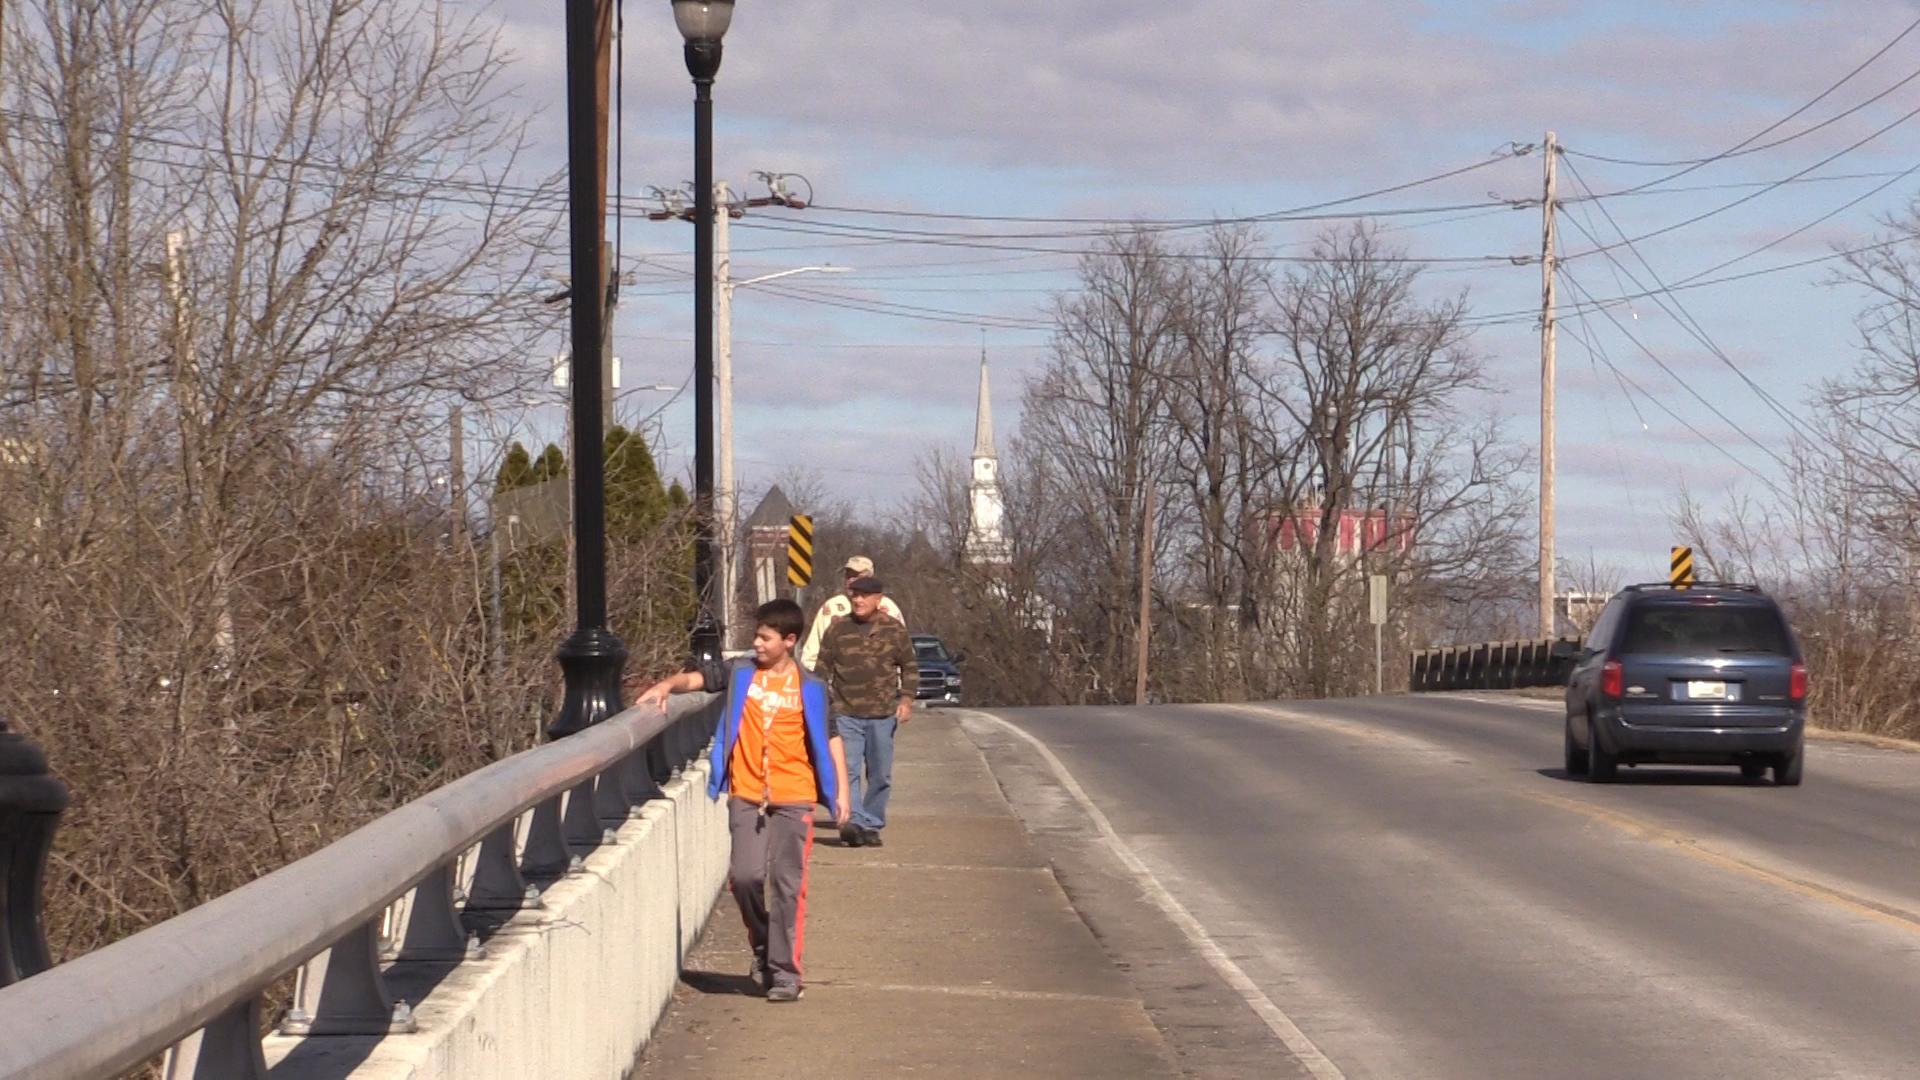 VIDEO - Mayor leads walk for health